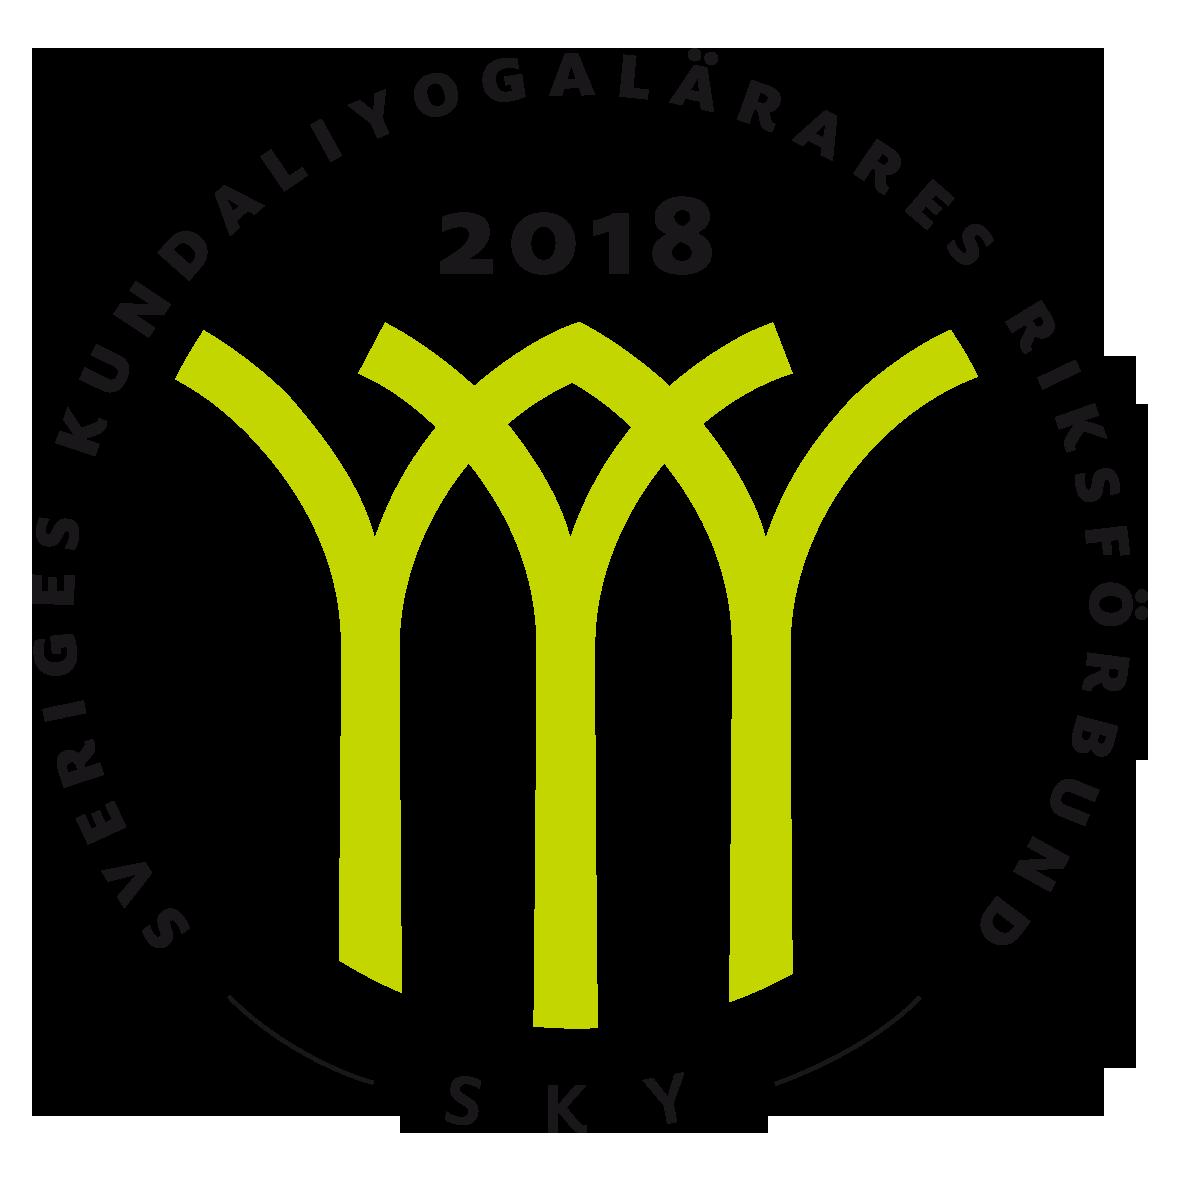 Sveriges Kundaliniyogalärares Riksförbund SKY Kvalitetssymbol 2018